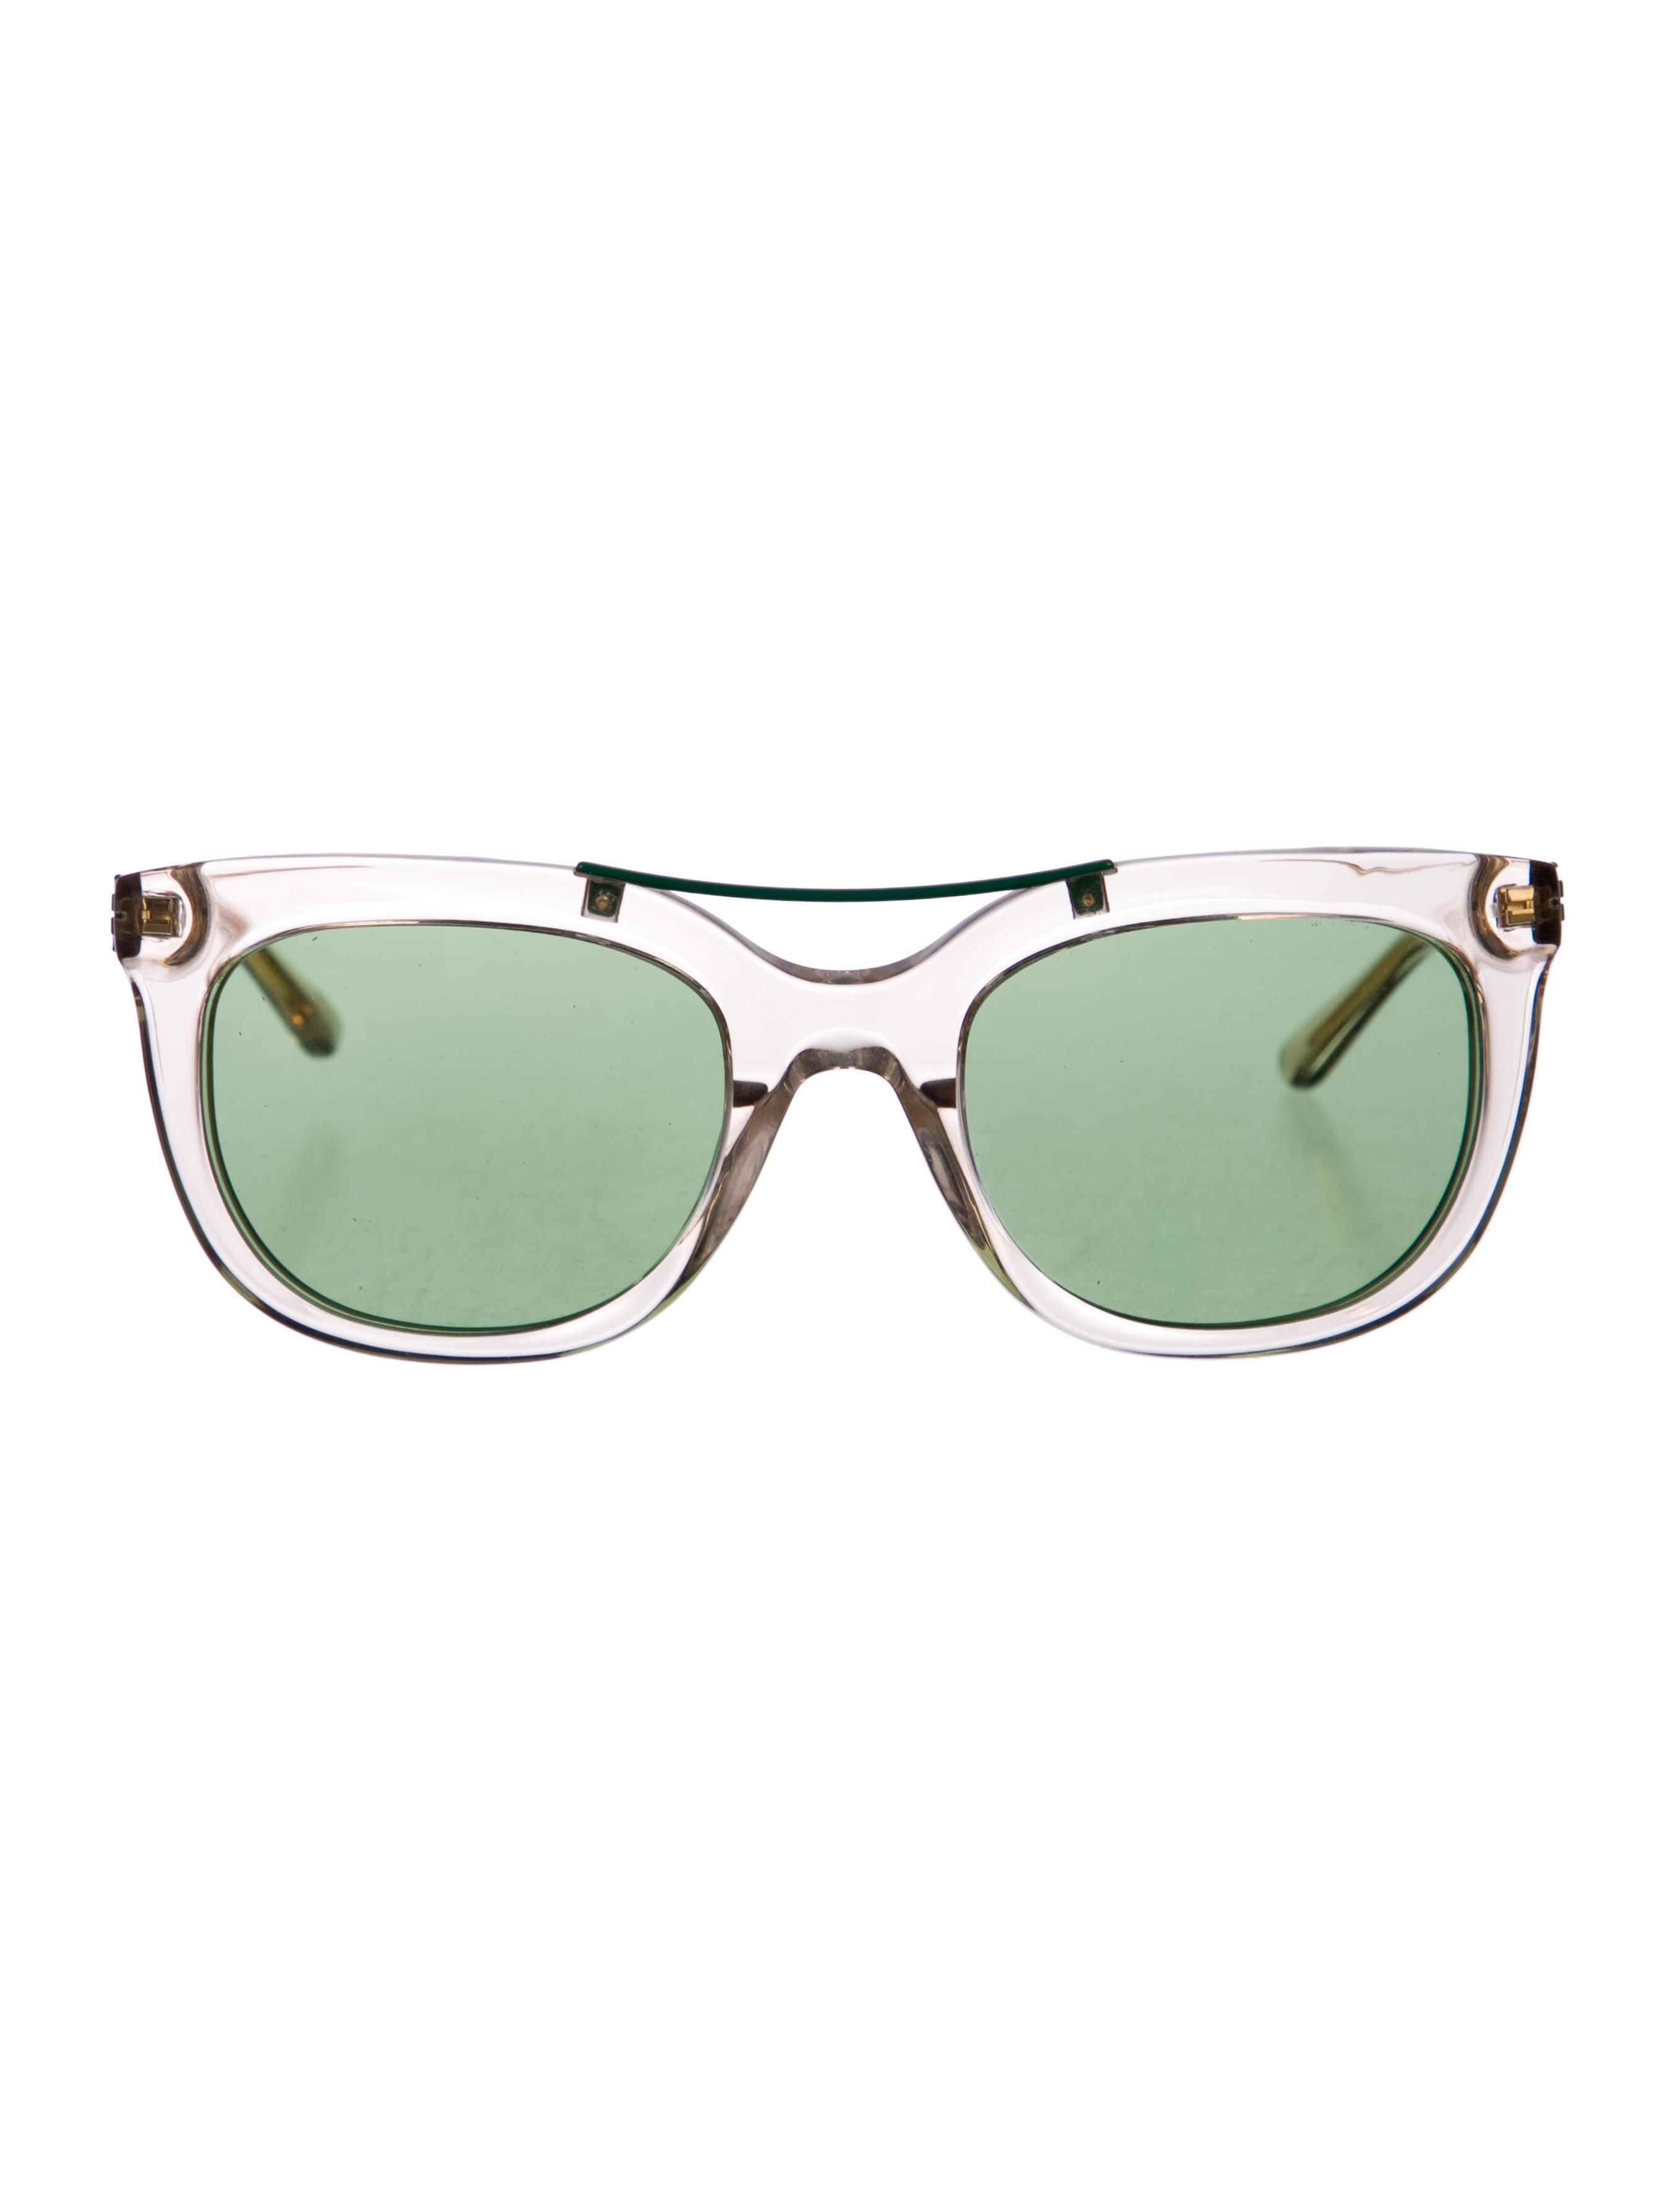 e3cbbb718adb8 Tory Burch Tinted Logo Sunglasses w  Tags - Accessories - WTO154942 ...